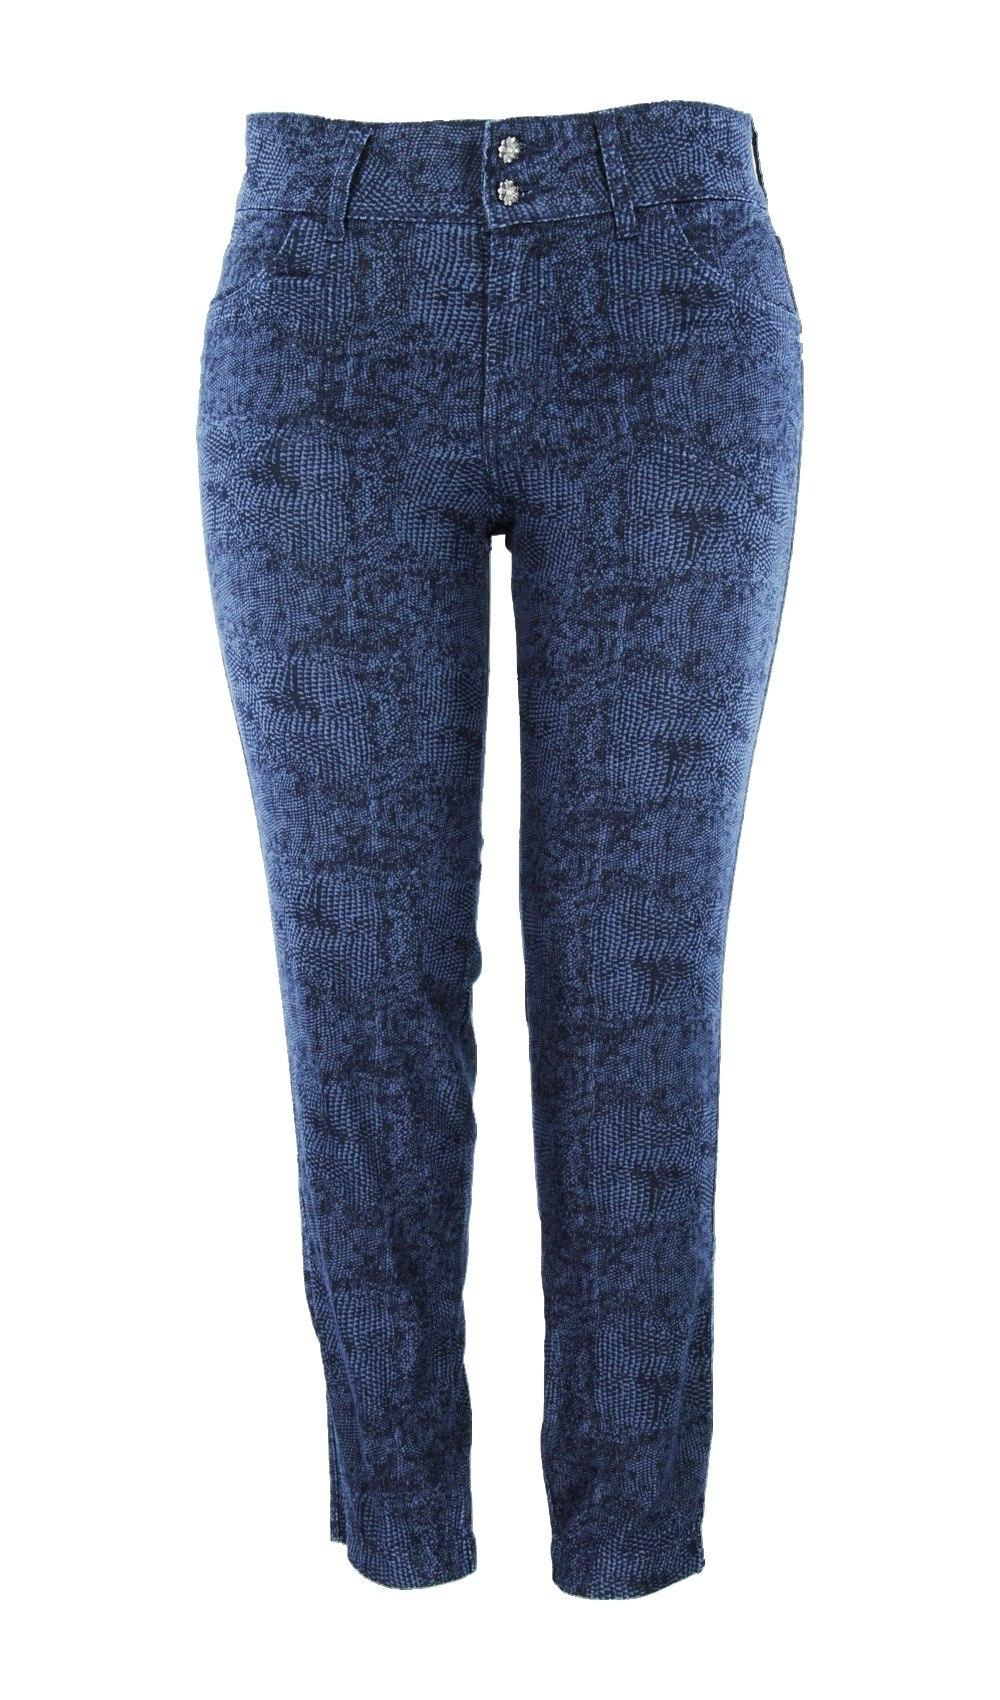 Cigarrete Eruption Jeans Estampada Asp [52168AM]